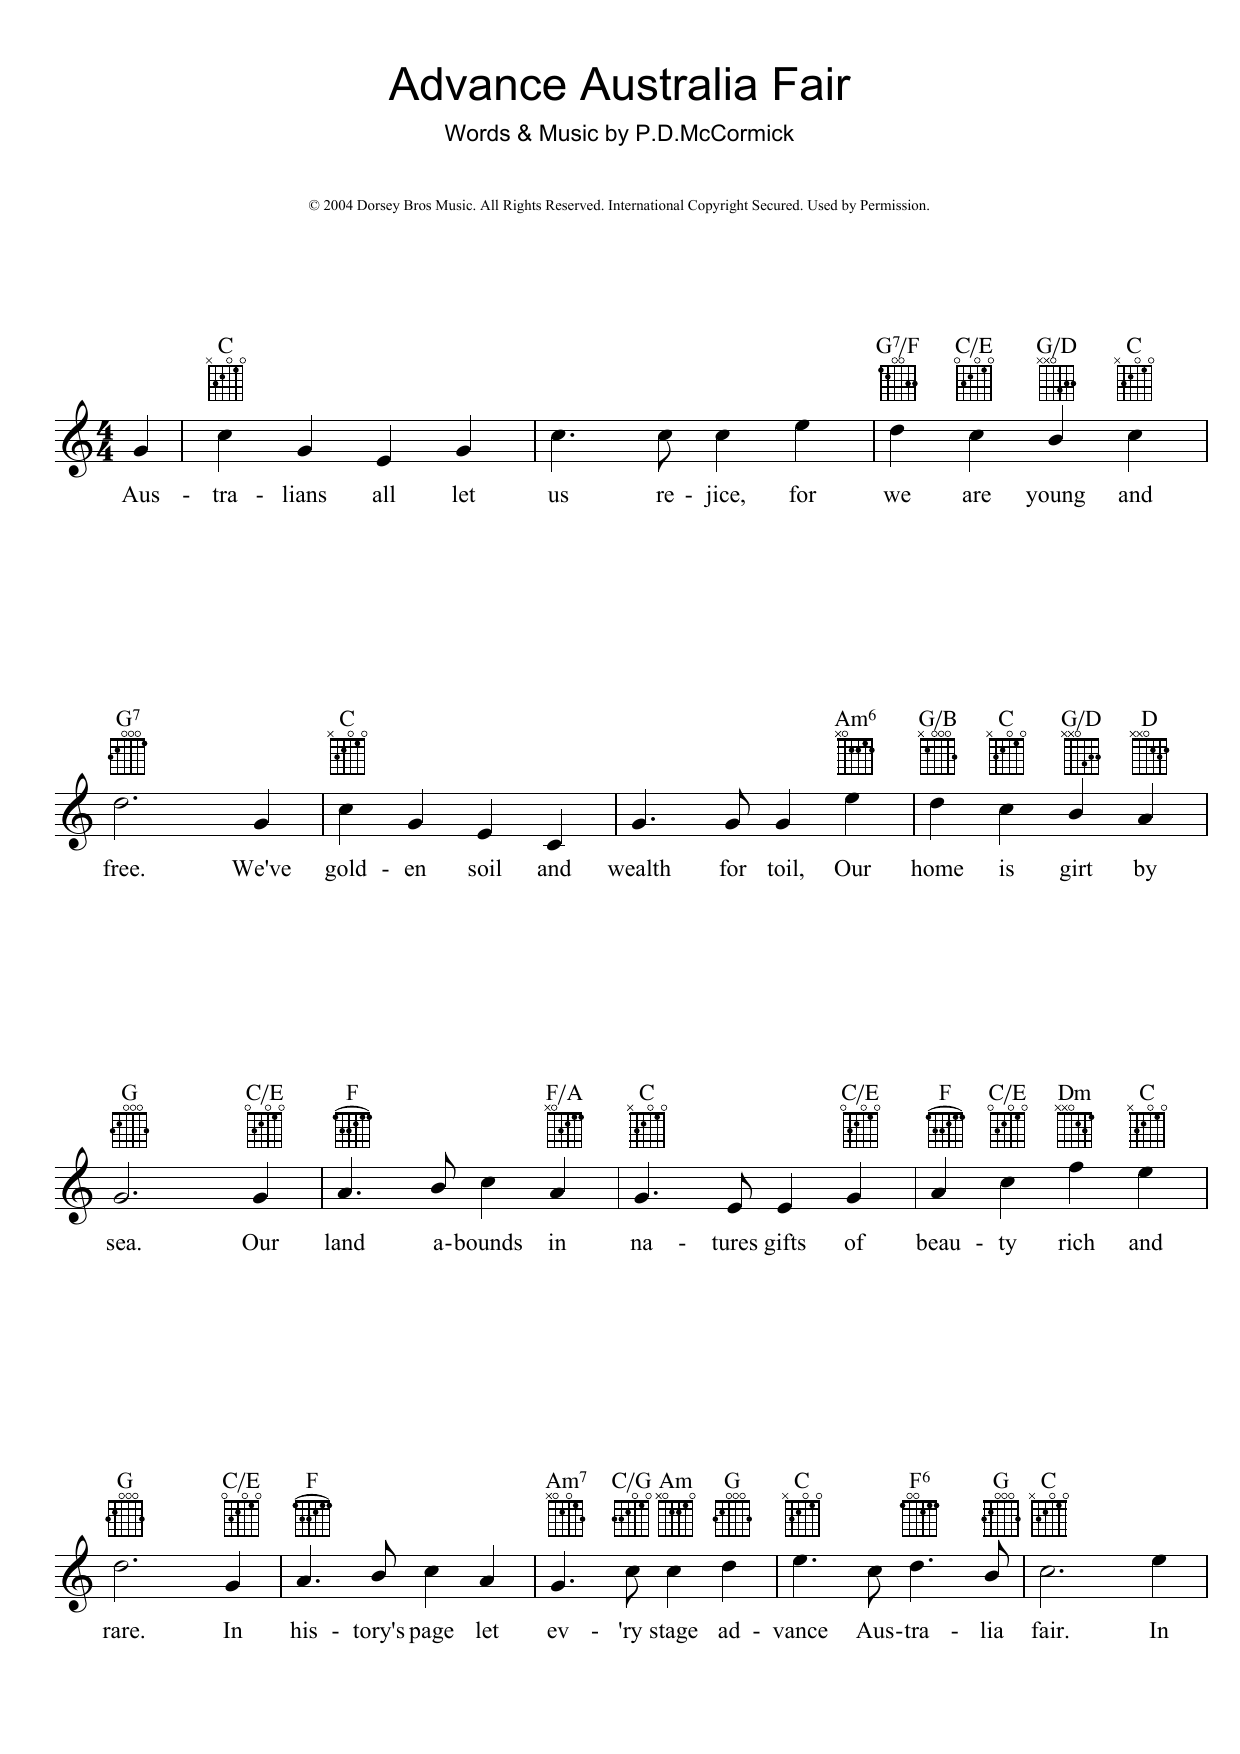 Peter McCormick - Advance Australia Fair (Australian National Anthem)